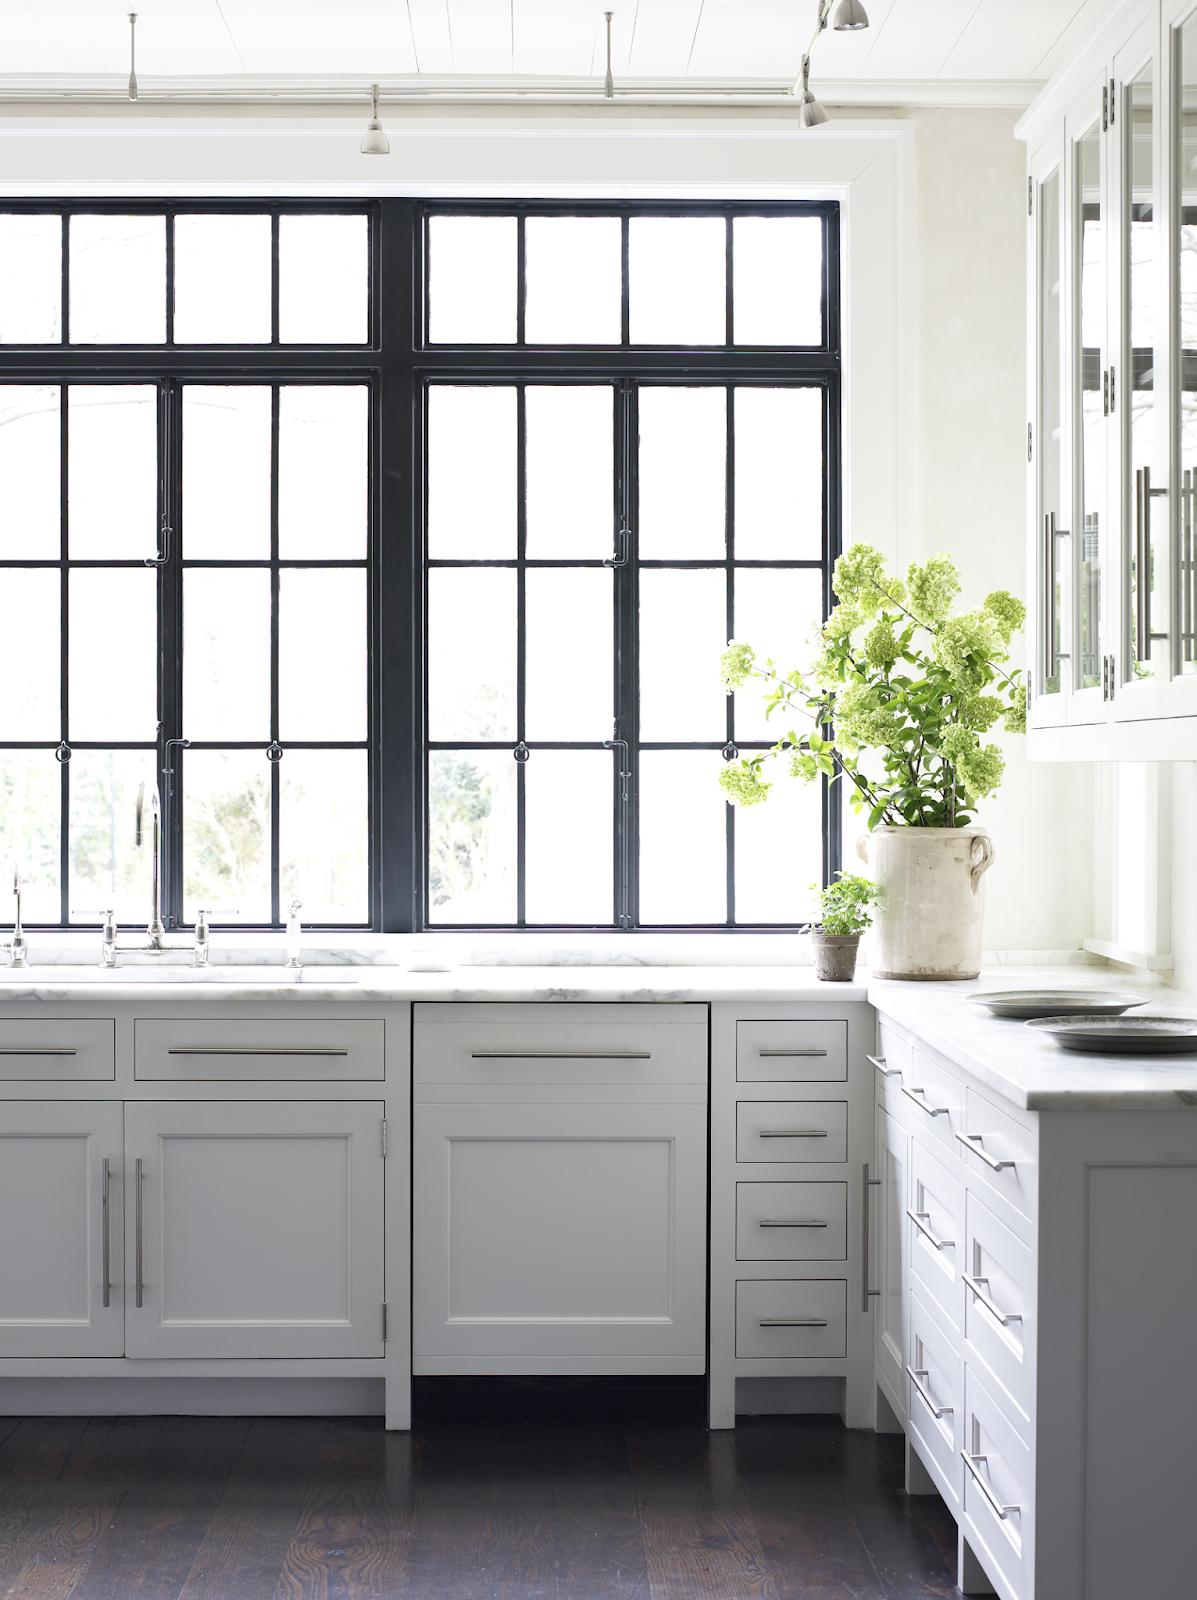 Rambling Renovators How To Make A Decorative Black Window Frame Insert Black Window Frames Black Windows Black Vinyl Windows